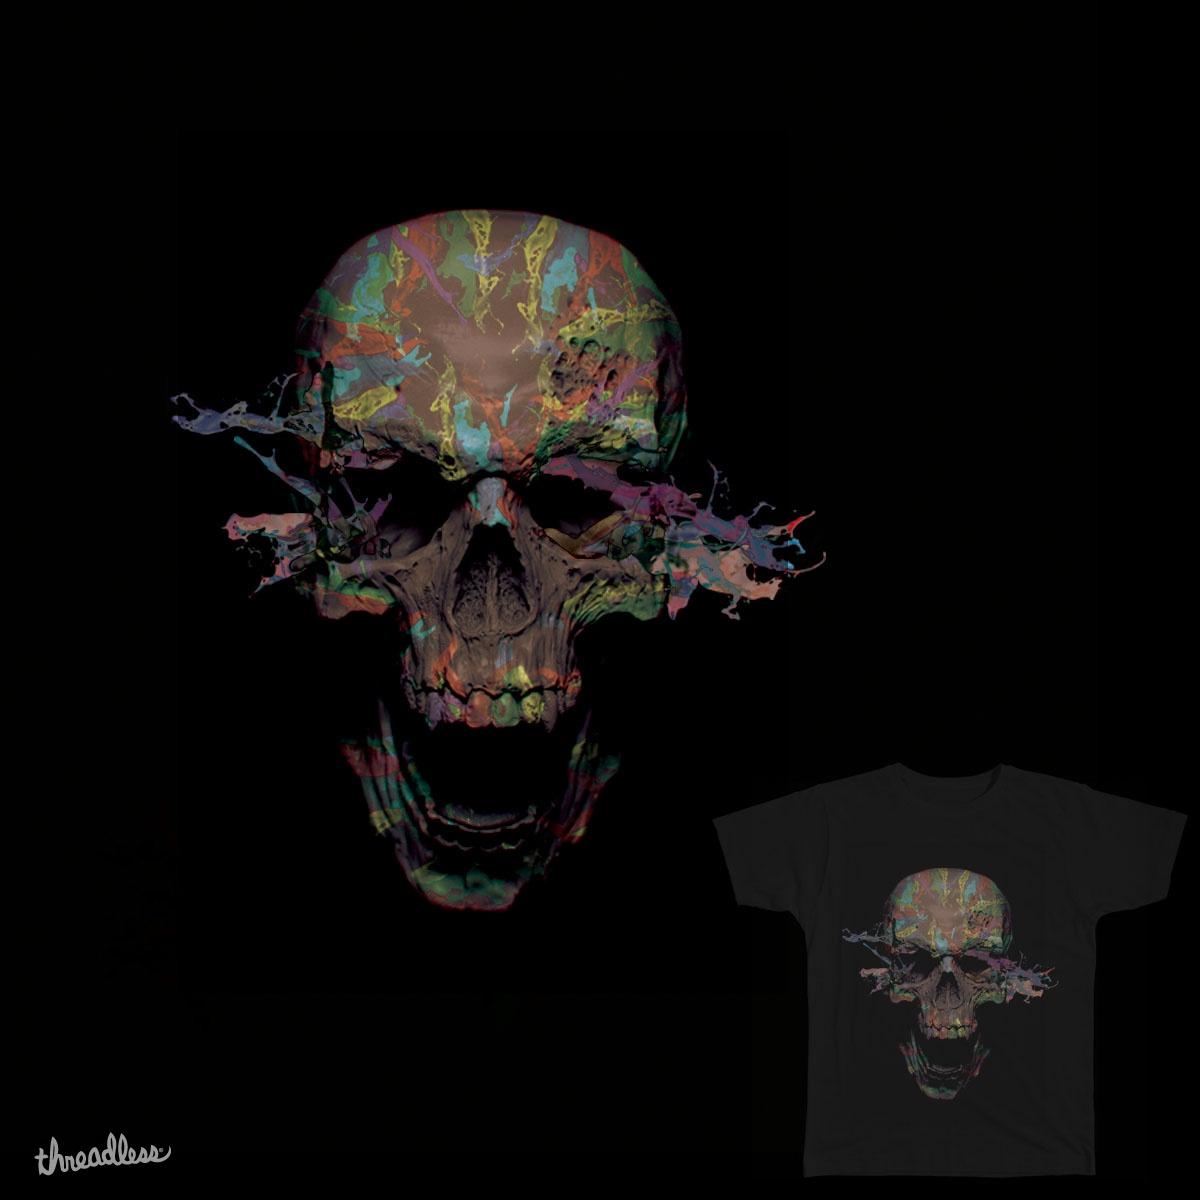 Splendid Skull by saimonanthony.a.suyko on Threadless